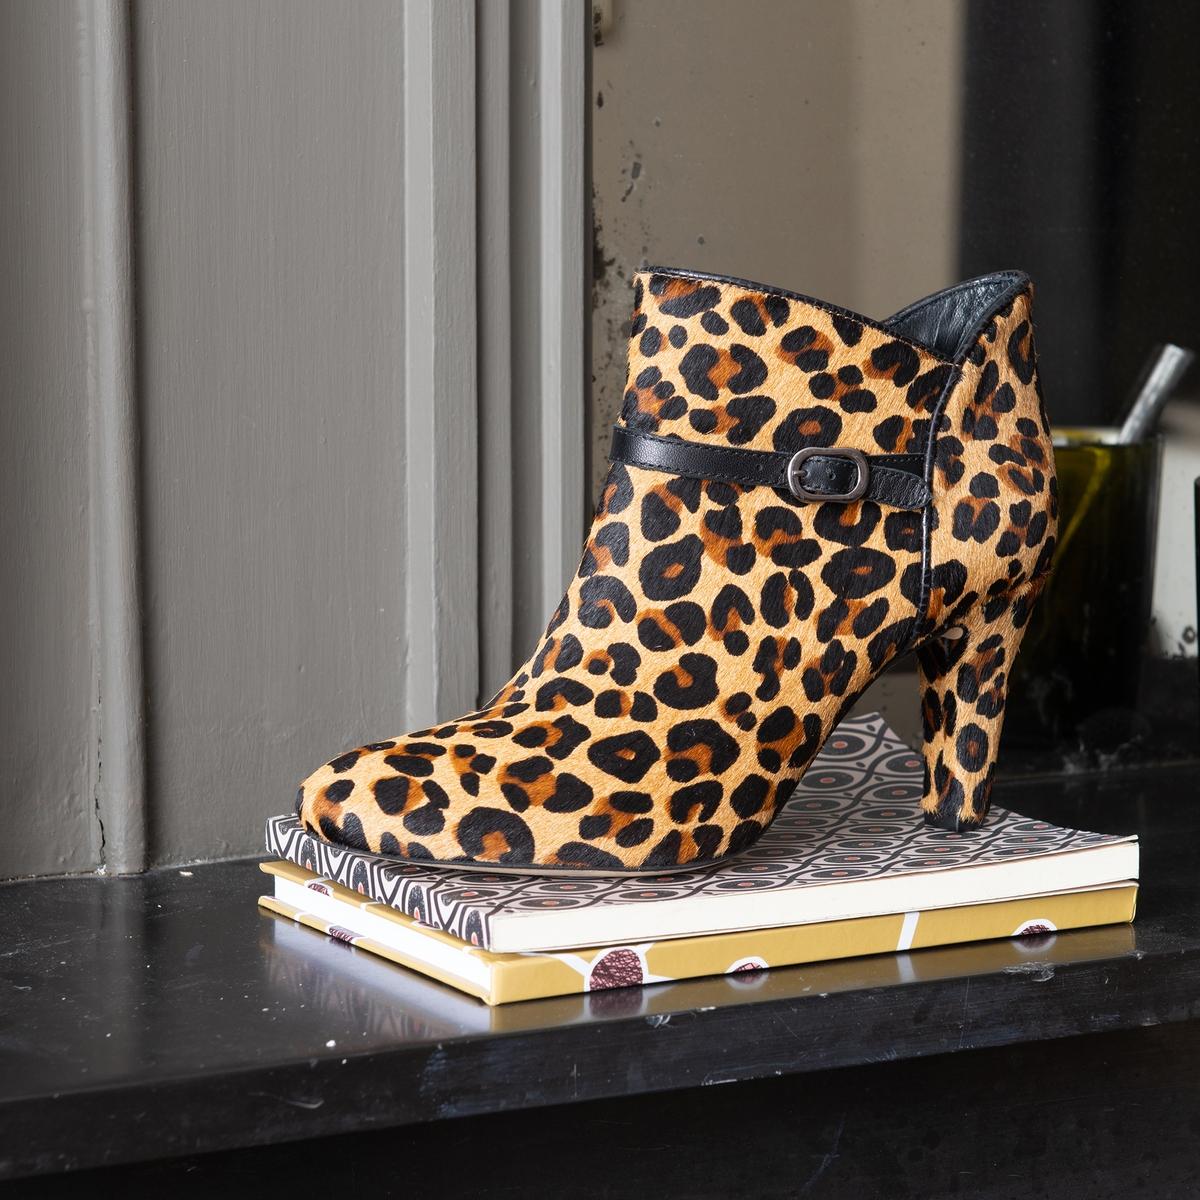 Botines leopardo de piel con cremallera Premium